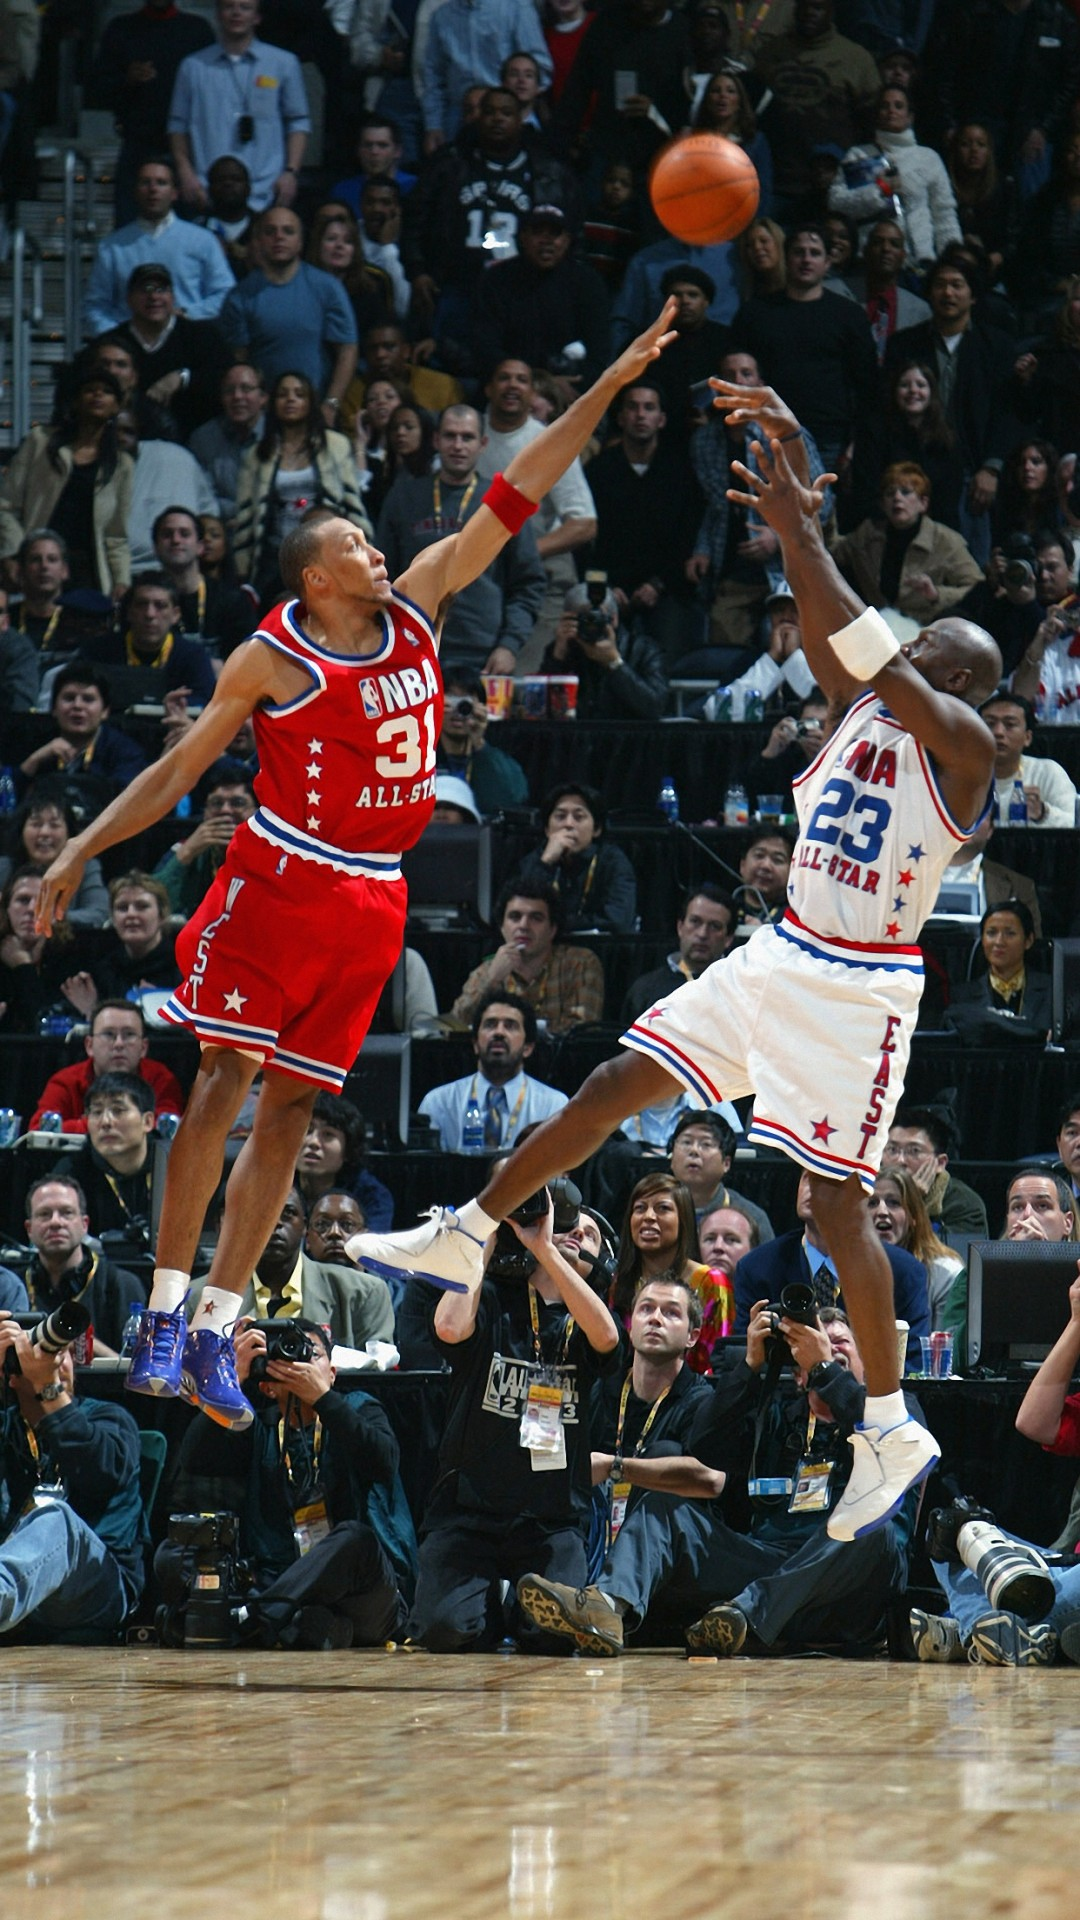 2048x2048 Michael Jordan Basketball Wallpaper Hd